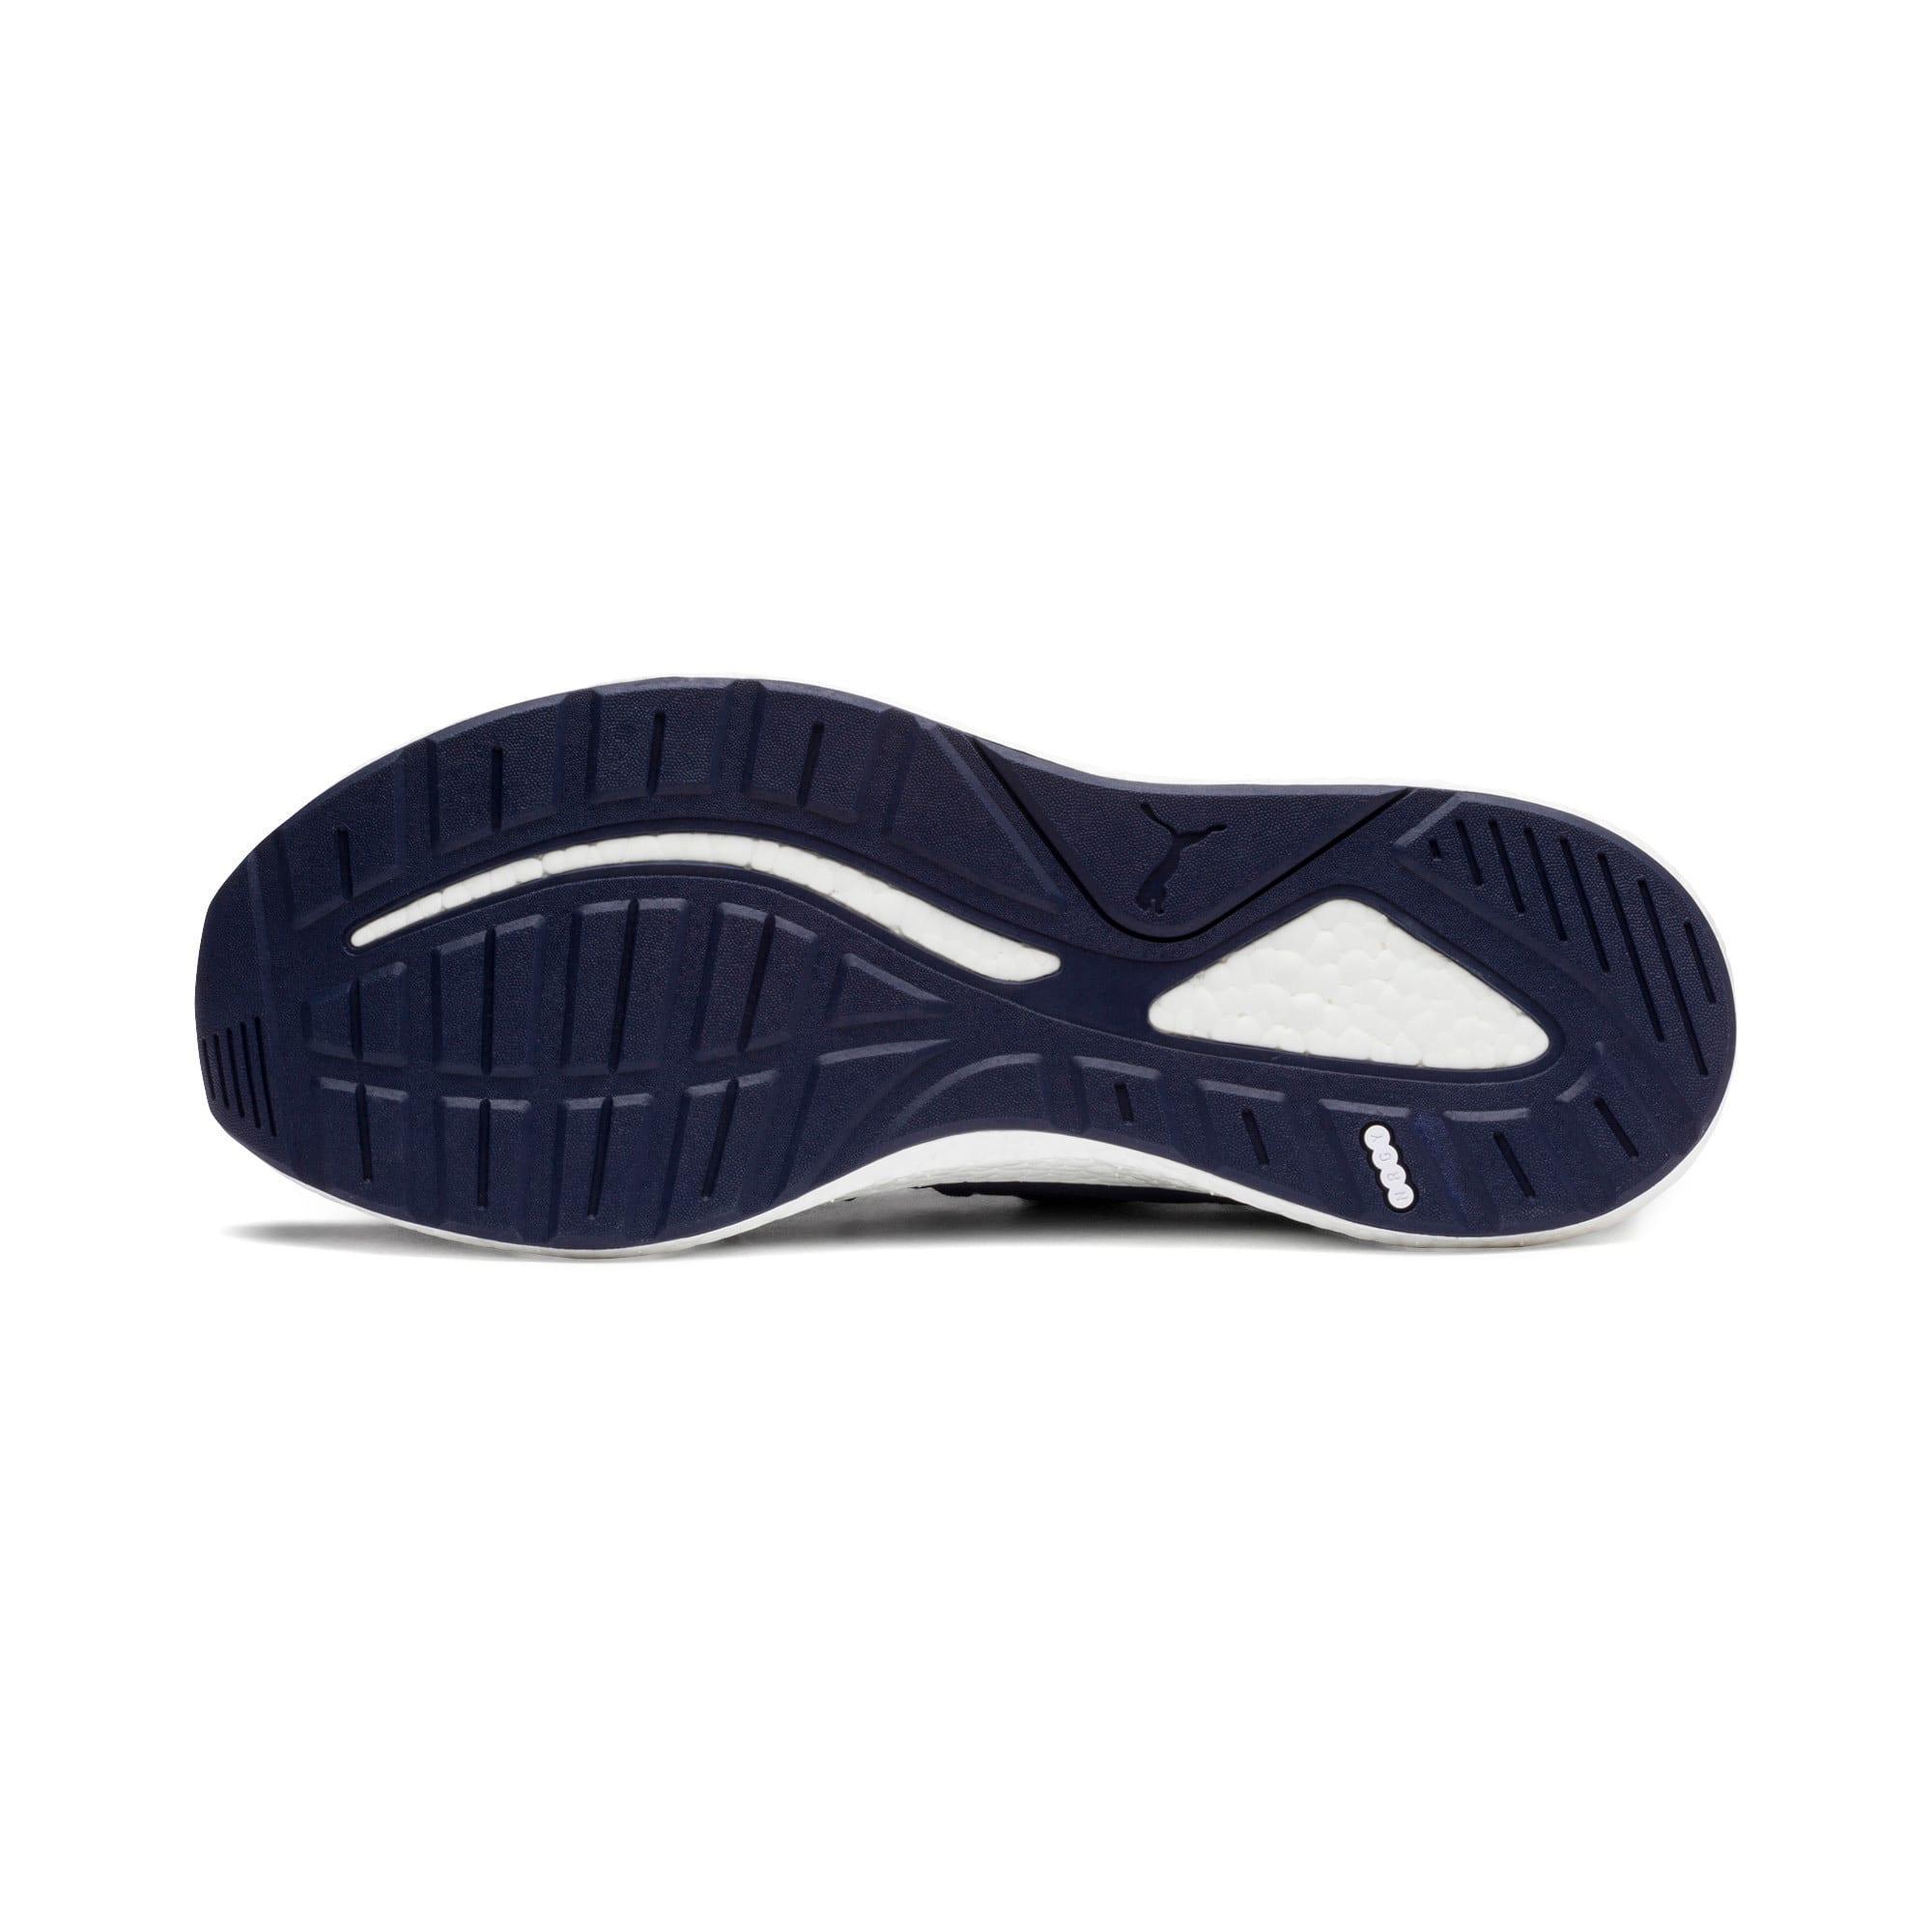 Miniatura 3 de Zapatos para correr NRGY Neko Knit para hombre, Peacoat-Strong Blue, mediano